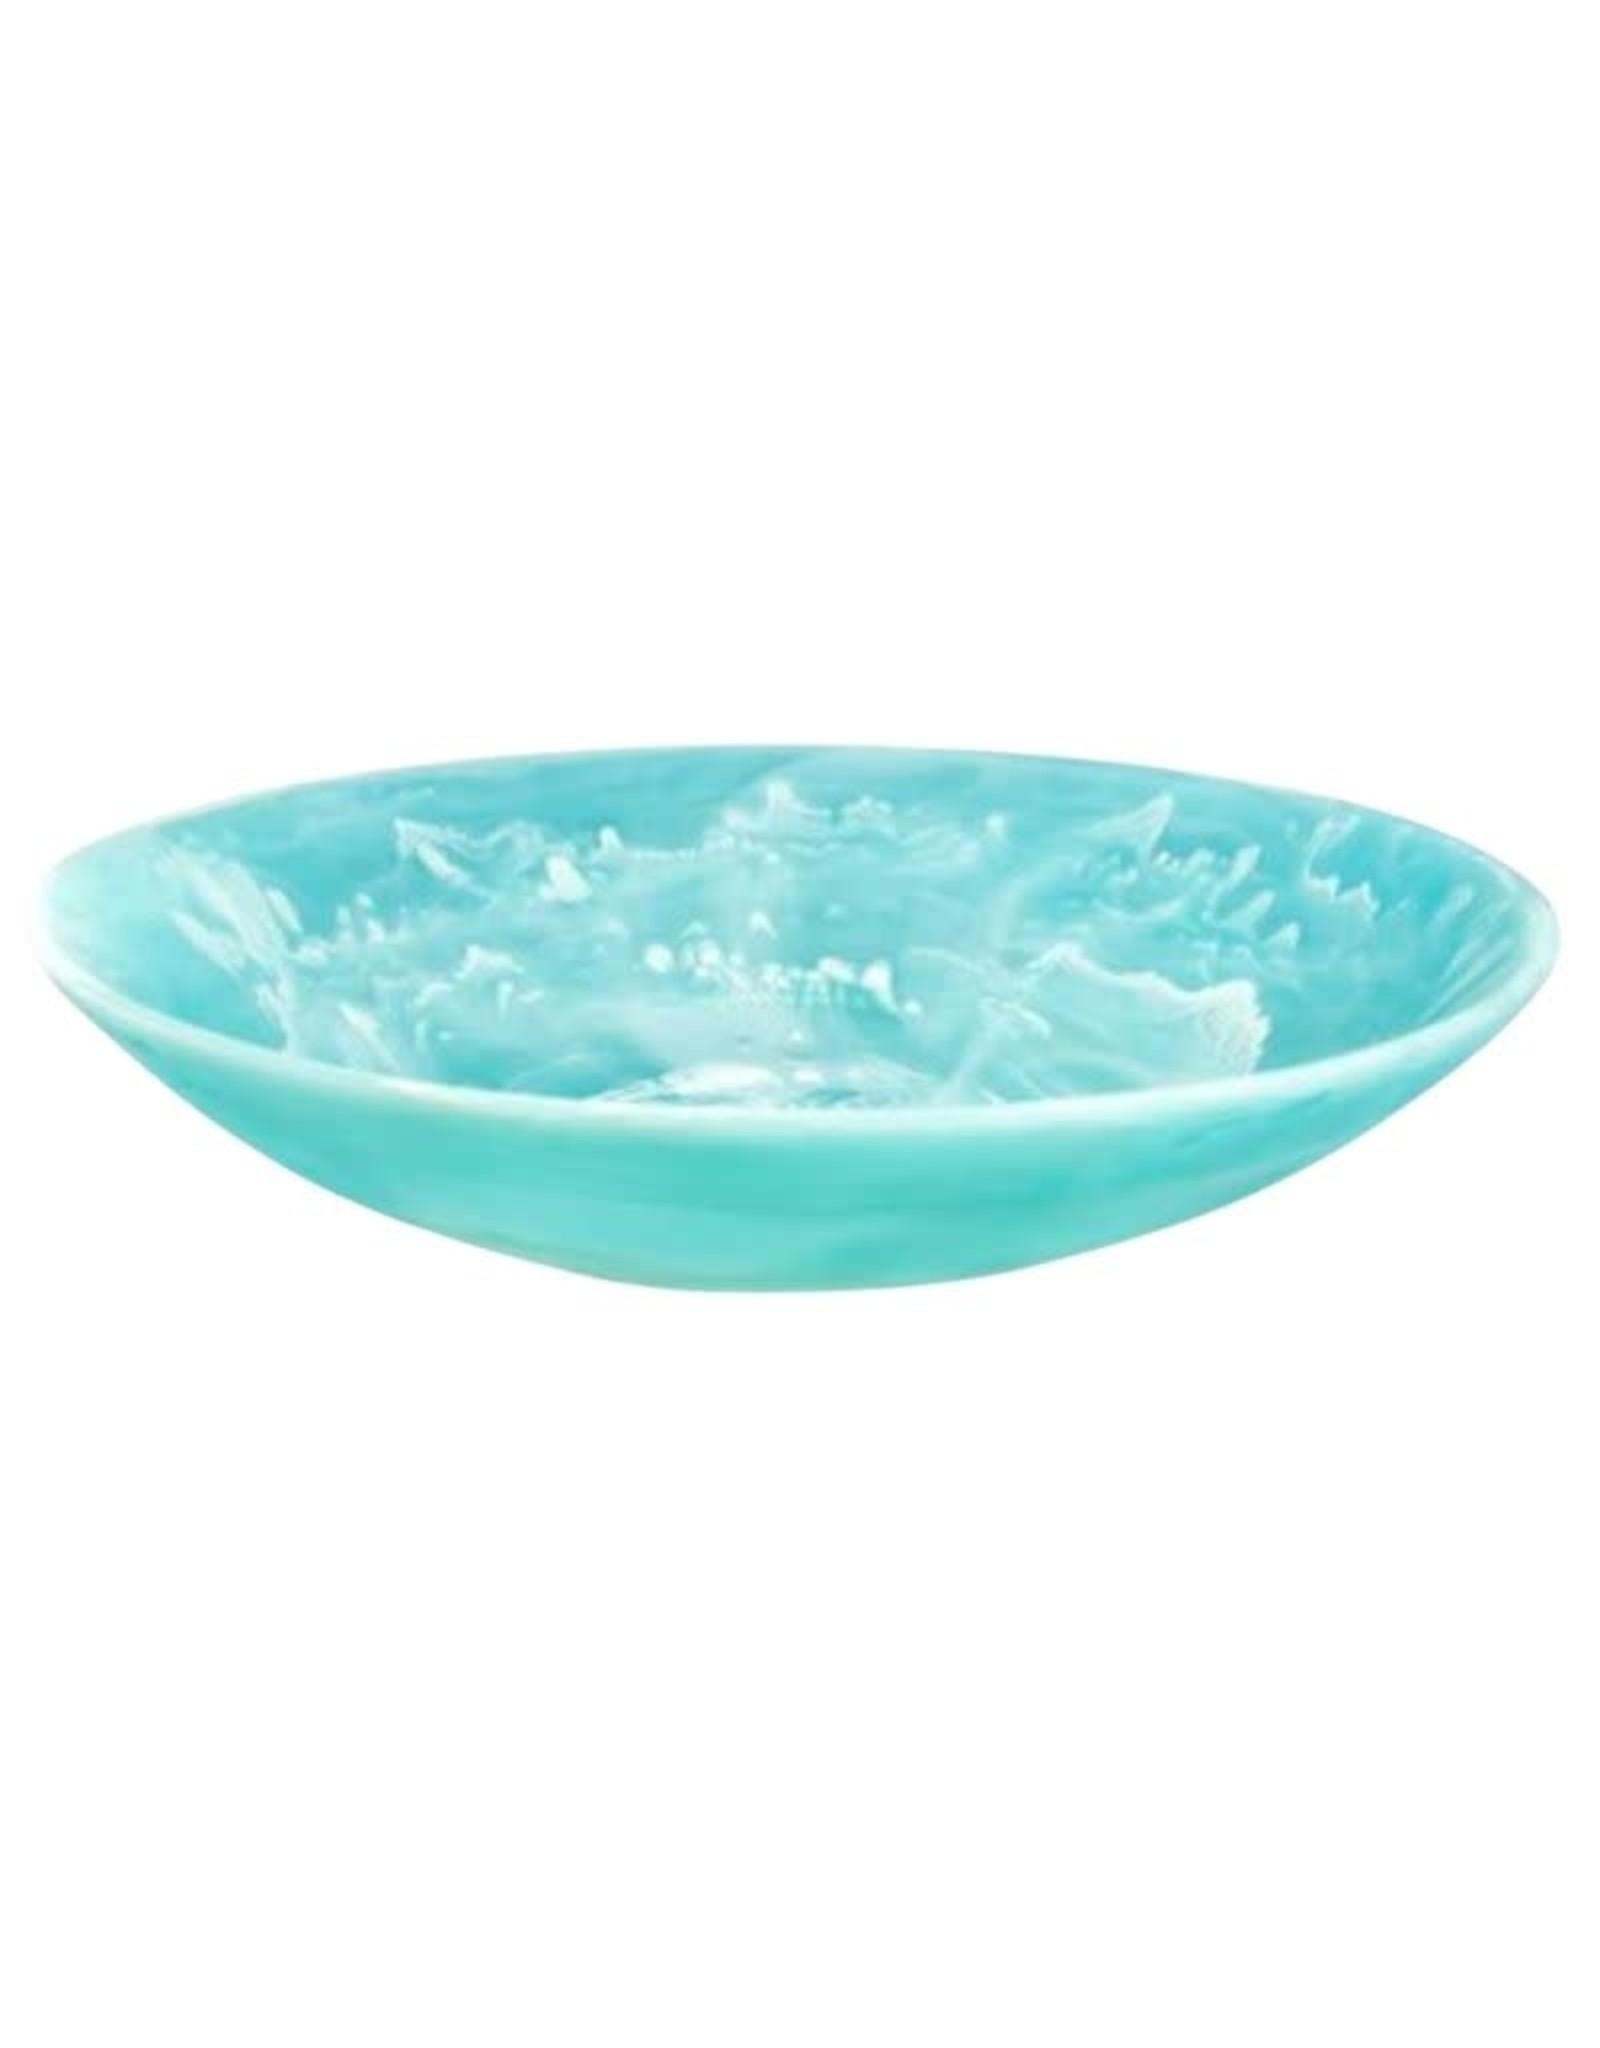 Nashi Home Everyday Medium Bowl w Salad Server Set 2pc - Aqua Swirl